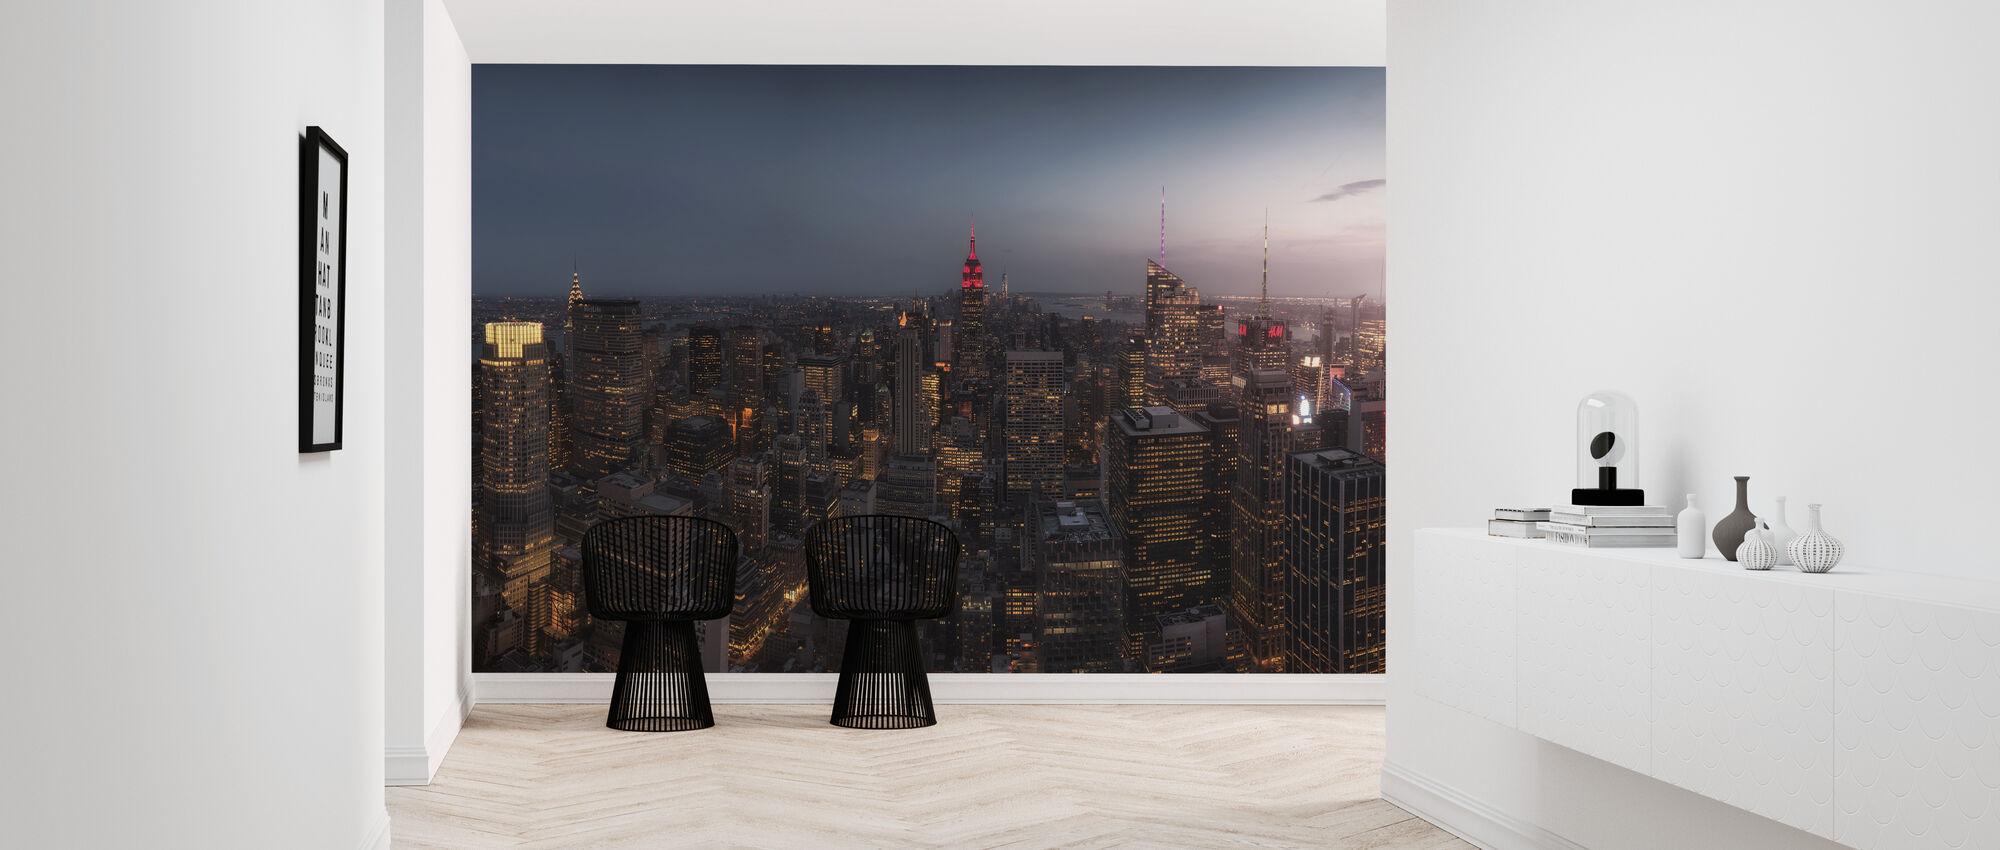 Lights of New York - Wallpaper - Hallway